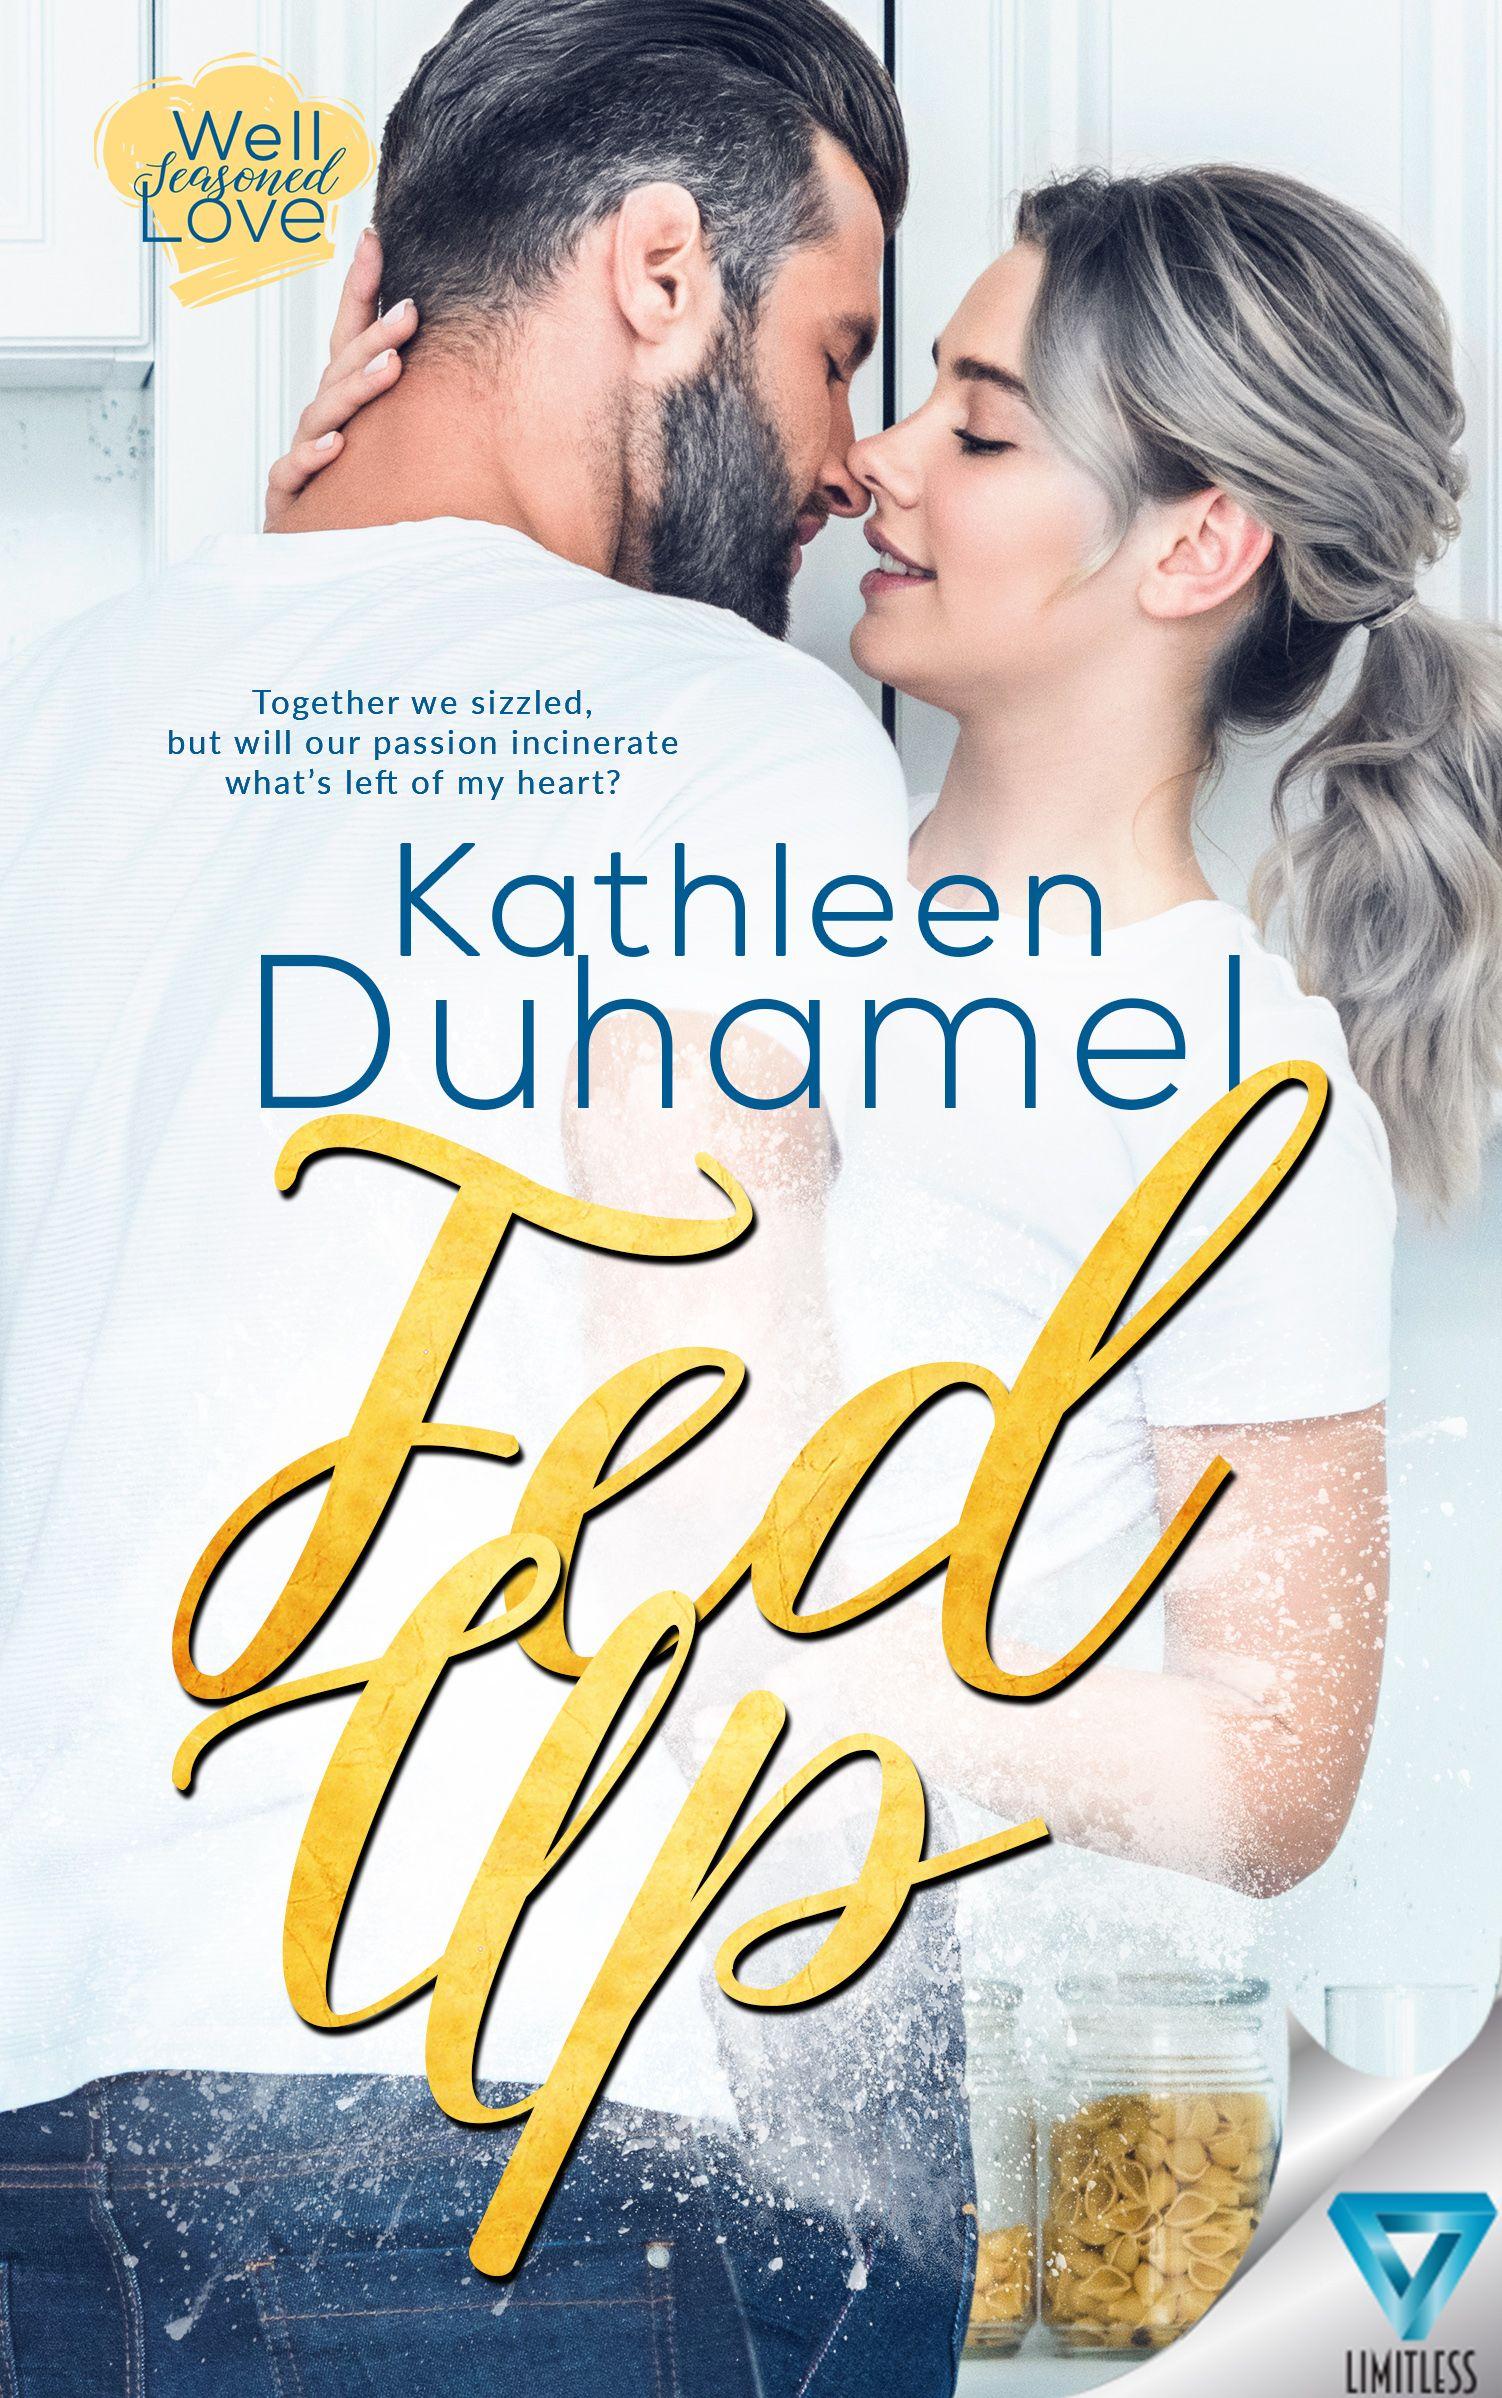 Kathleen duhamel contemporary romance book cover design